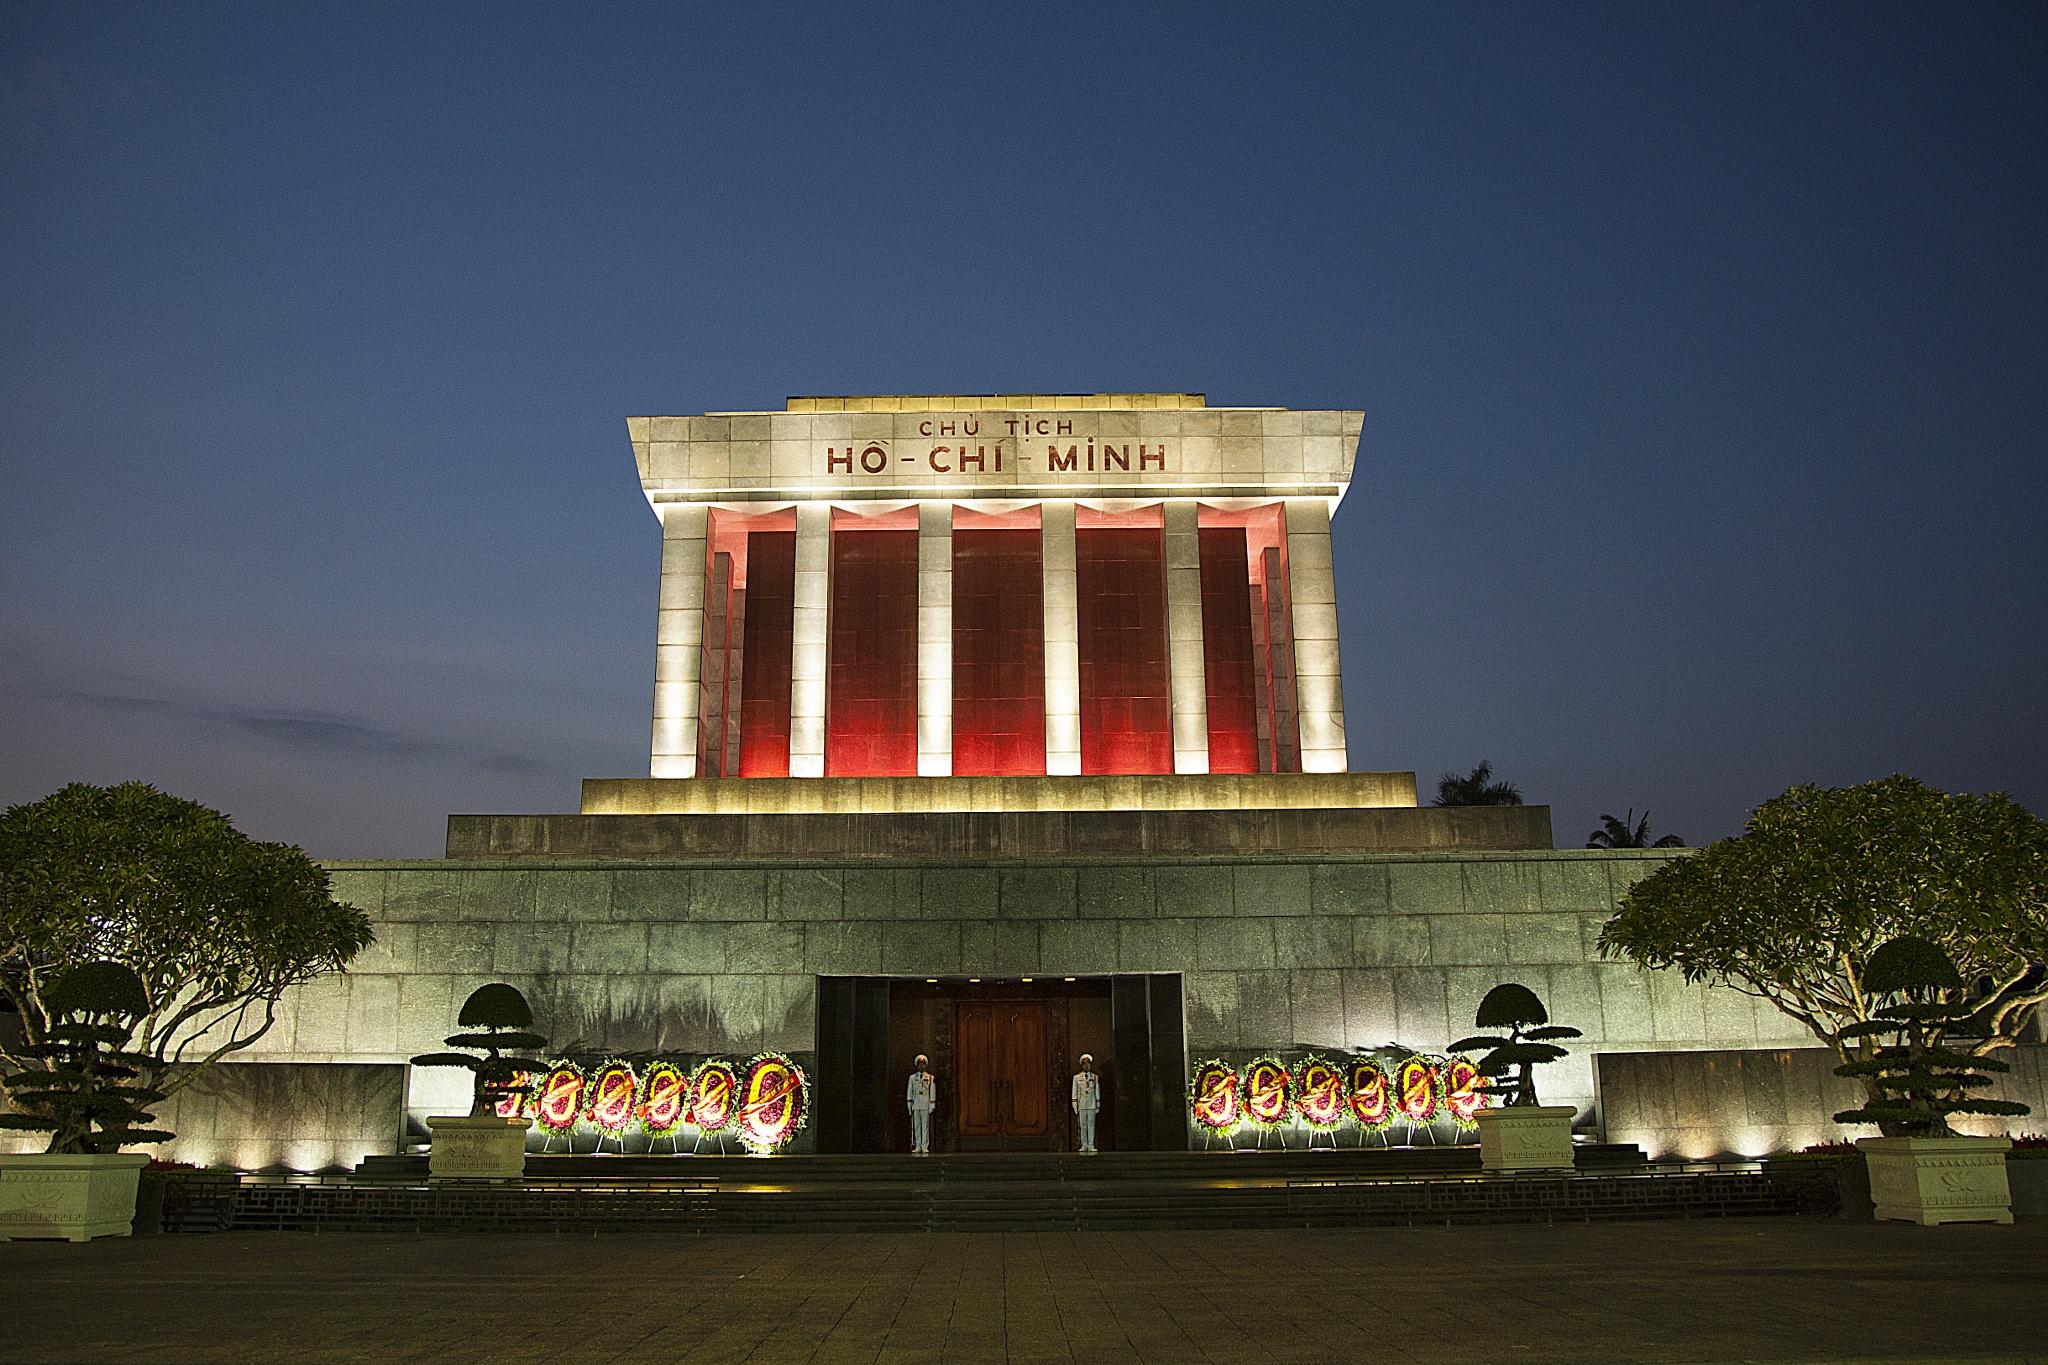 Ho Chi Minh Mausoleum, Hanoi, Vietnam by Anders Jonsson